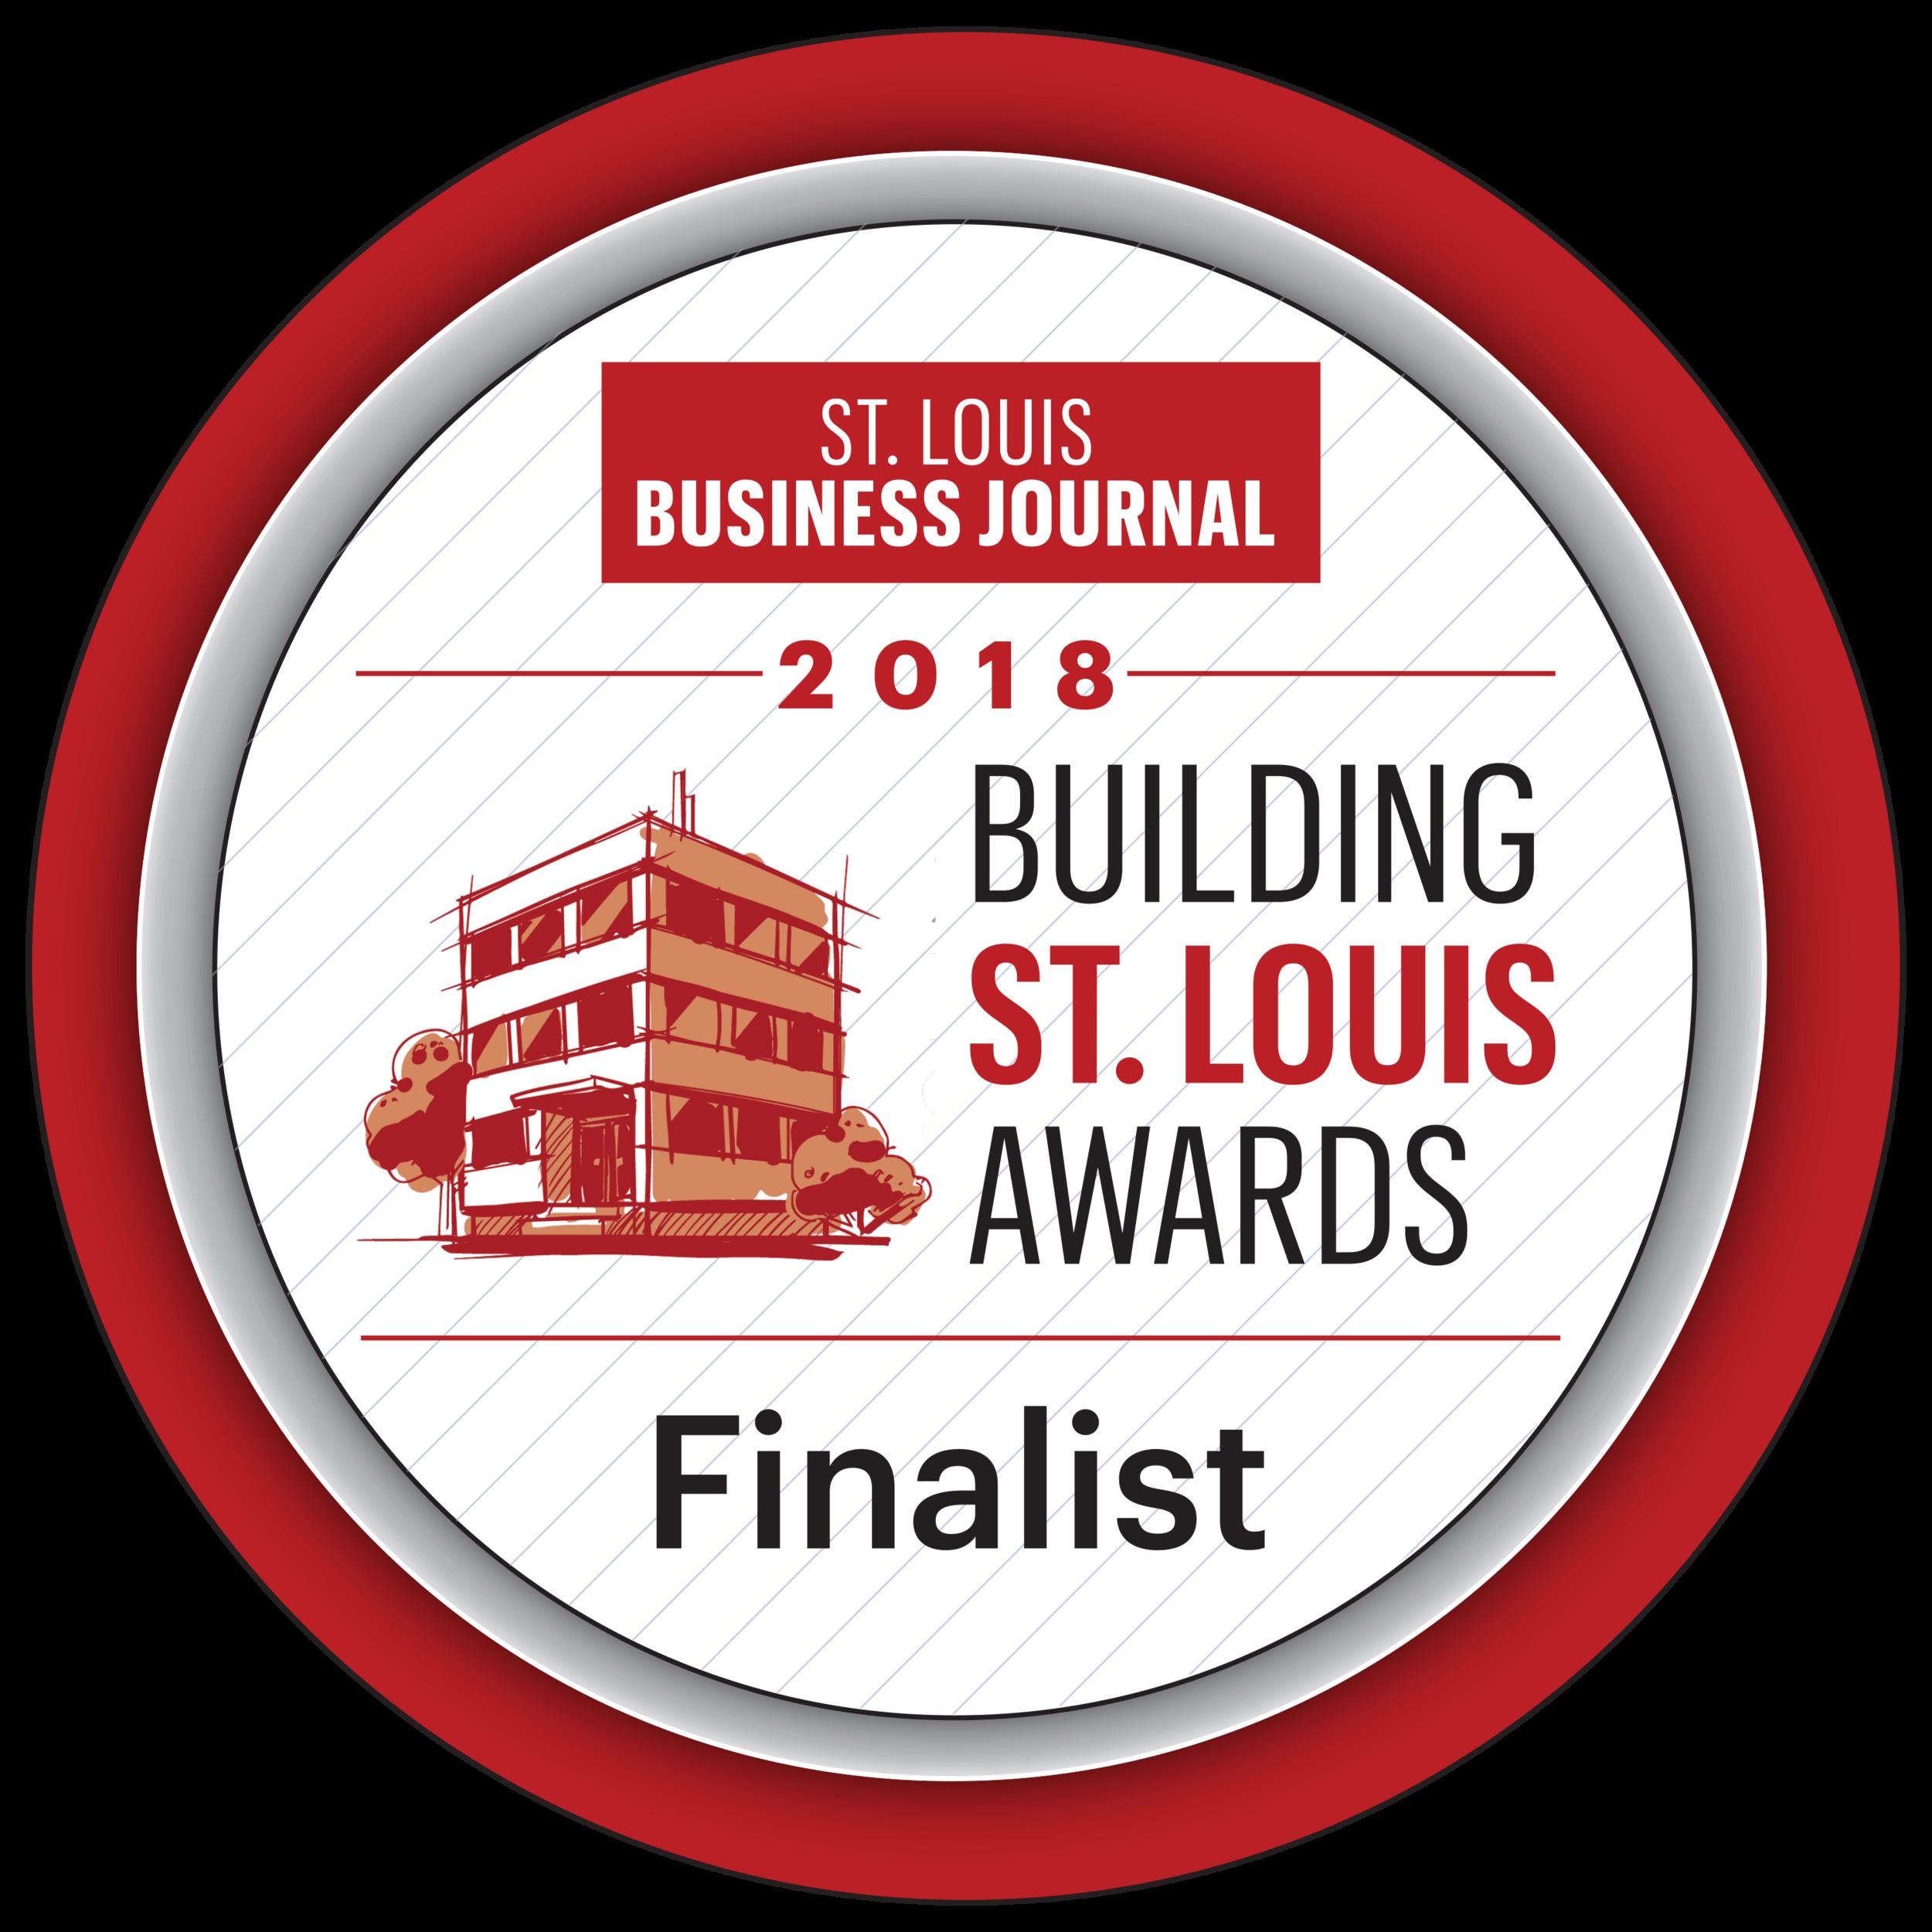 2018 Building St. Louis Awards